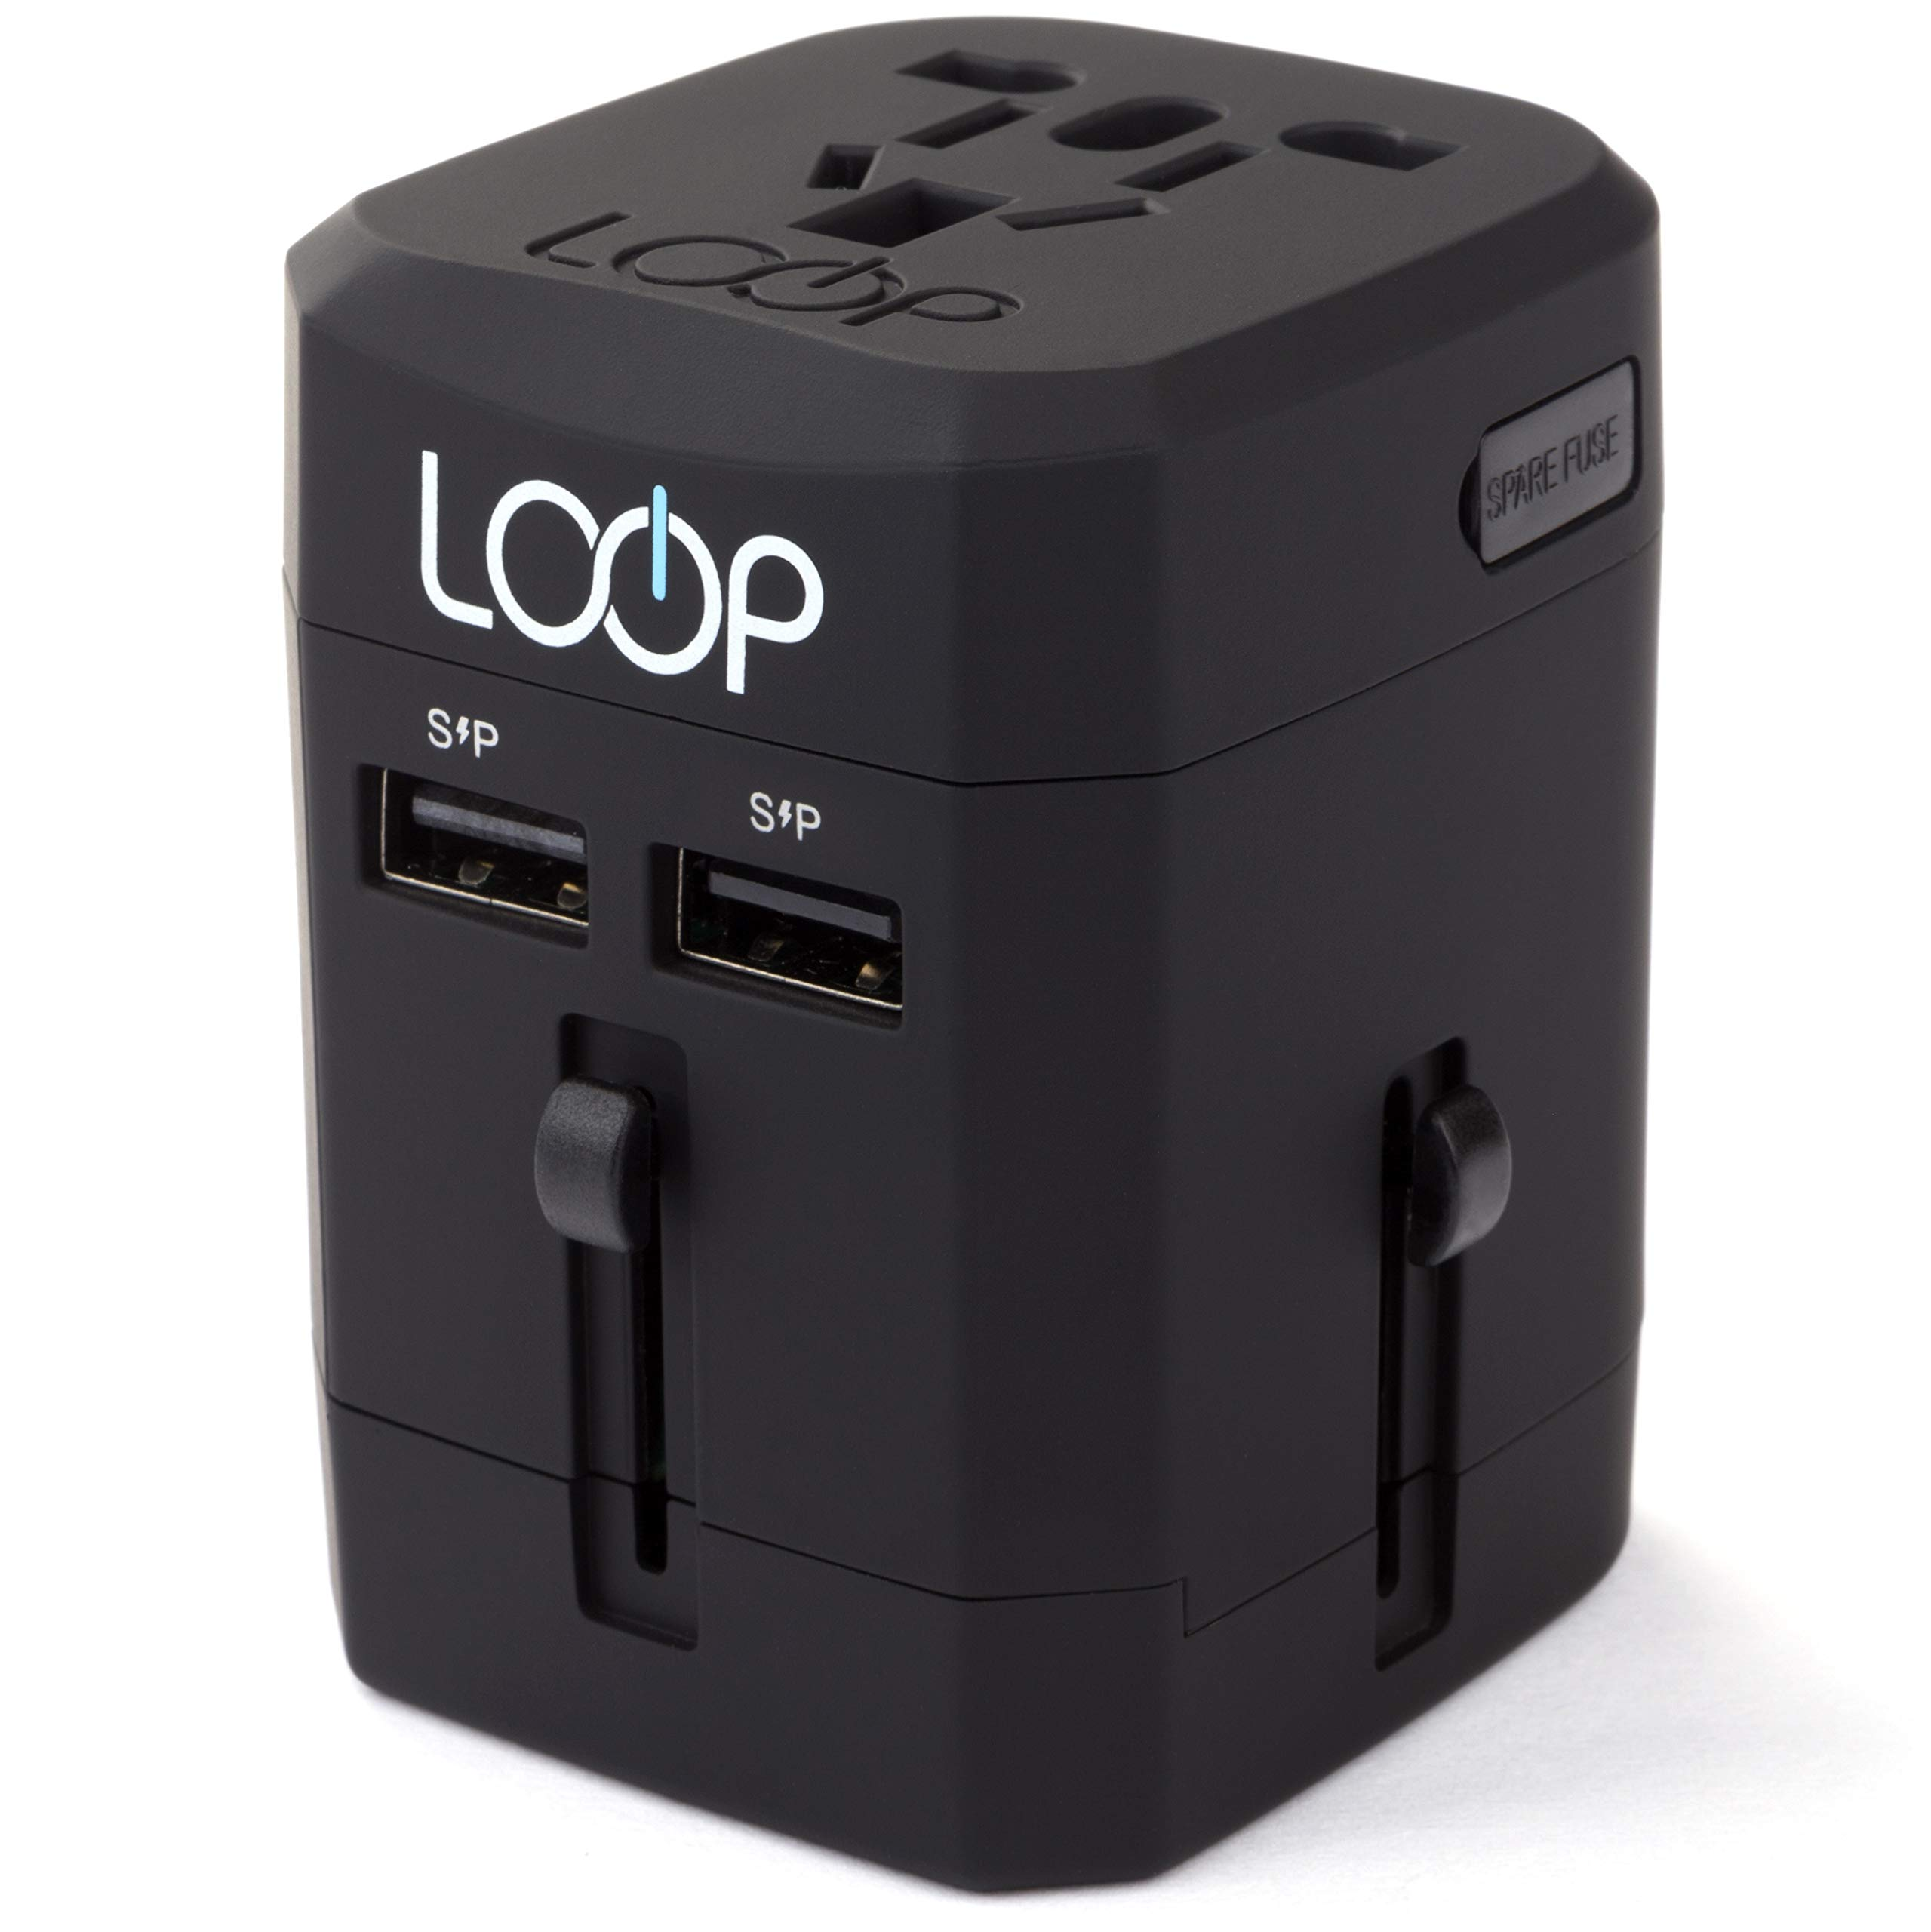 LOOP World Adapter Plug, Worldwide Travel Adapter Charger [US UK EU AU/CN] w/Dual USB Charging Ports & Universal AC Socket - Safety Fused (Black)